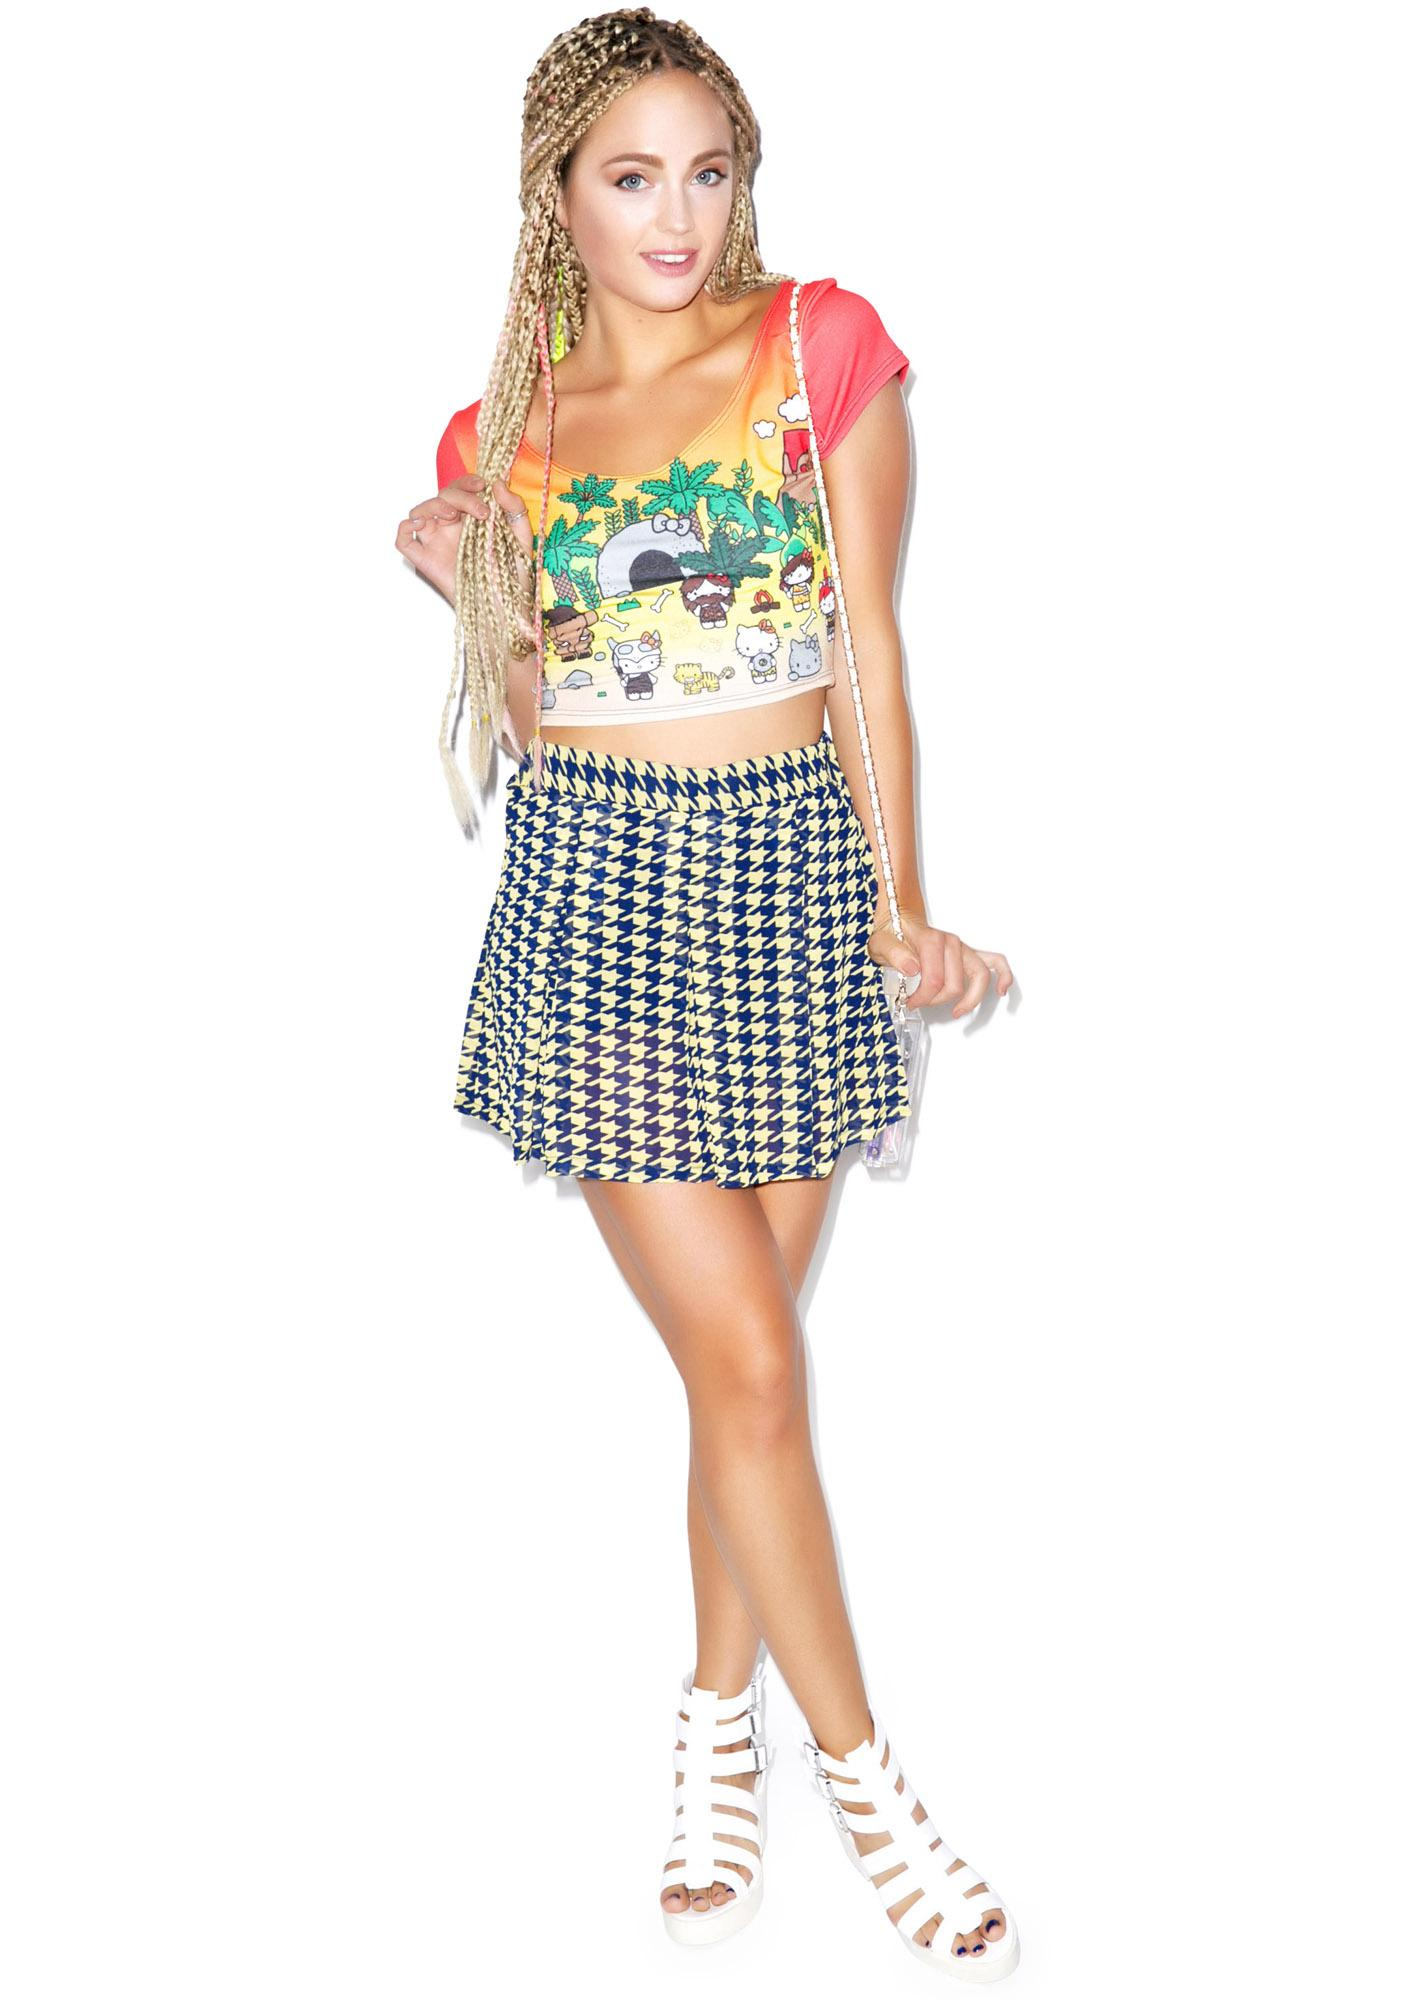 Japan L.A. Hello Kitty Caveman Short Sleeve Crop Top